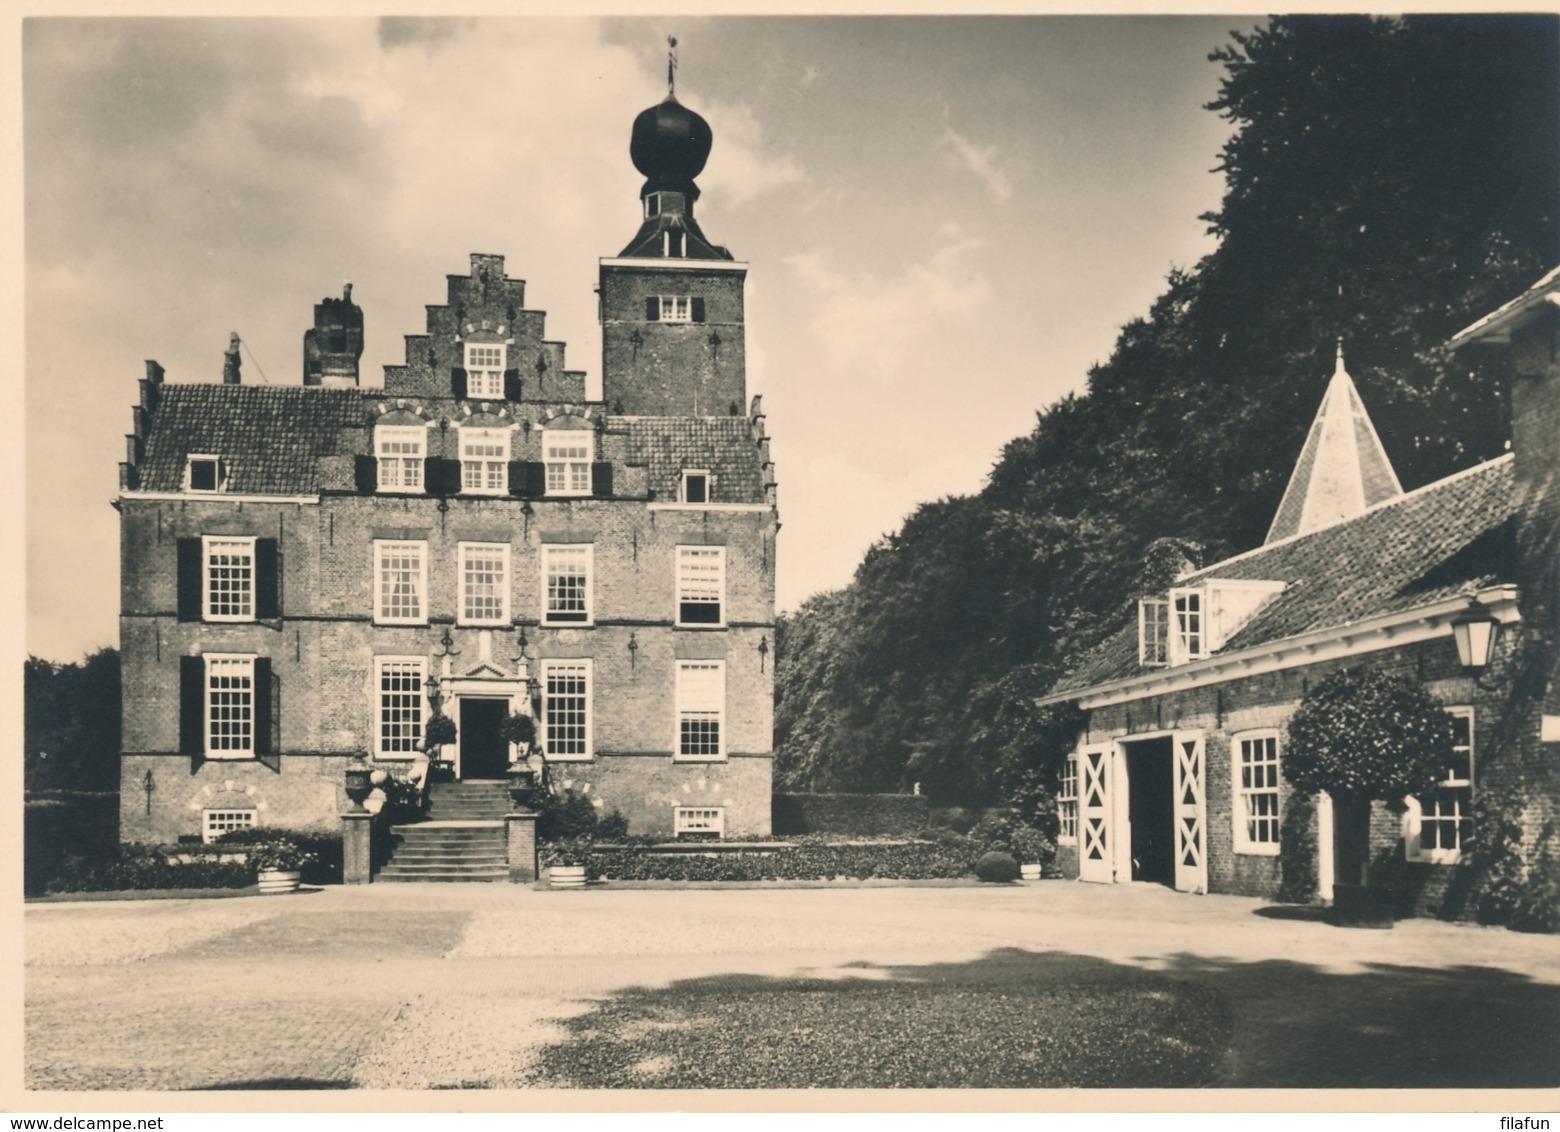 Nederland - 1946 - Kastelenserie 13 - Leersum Kasteel Zuylestein - Foto-briefkaart G286m Ongebruikt - Entiers Postaux